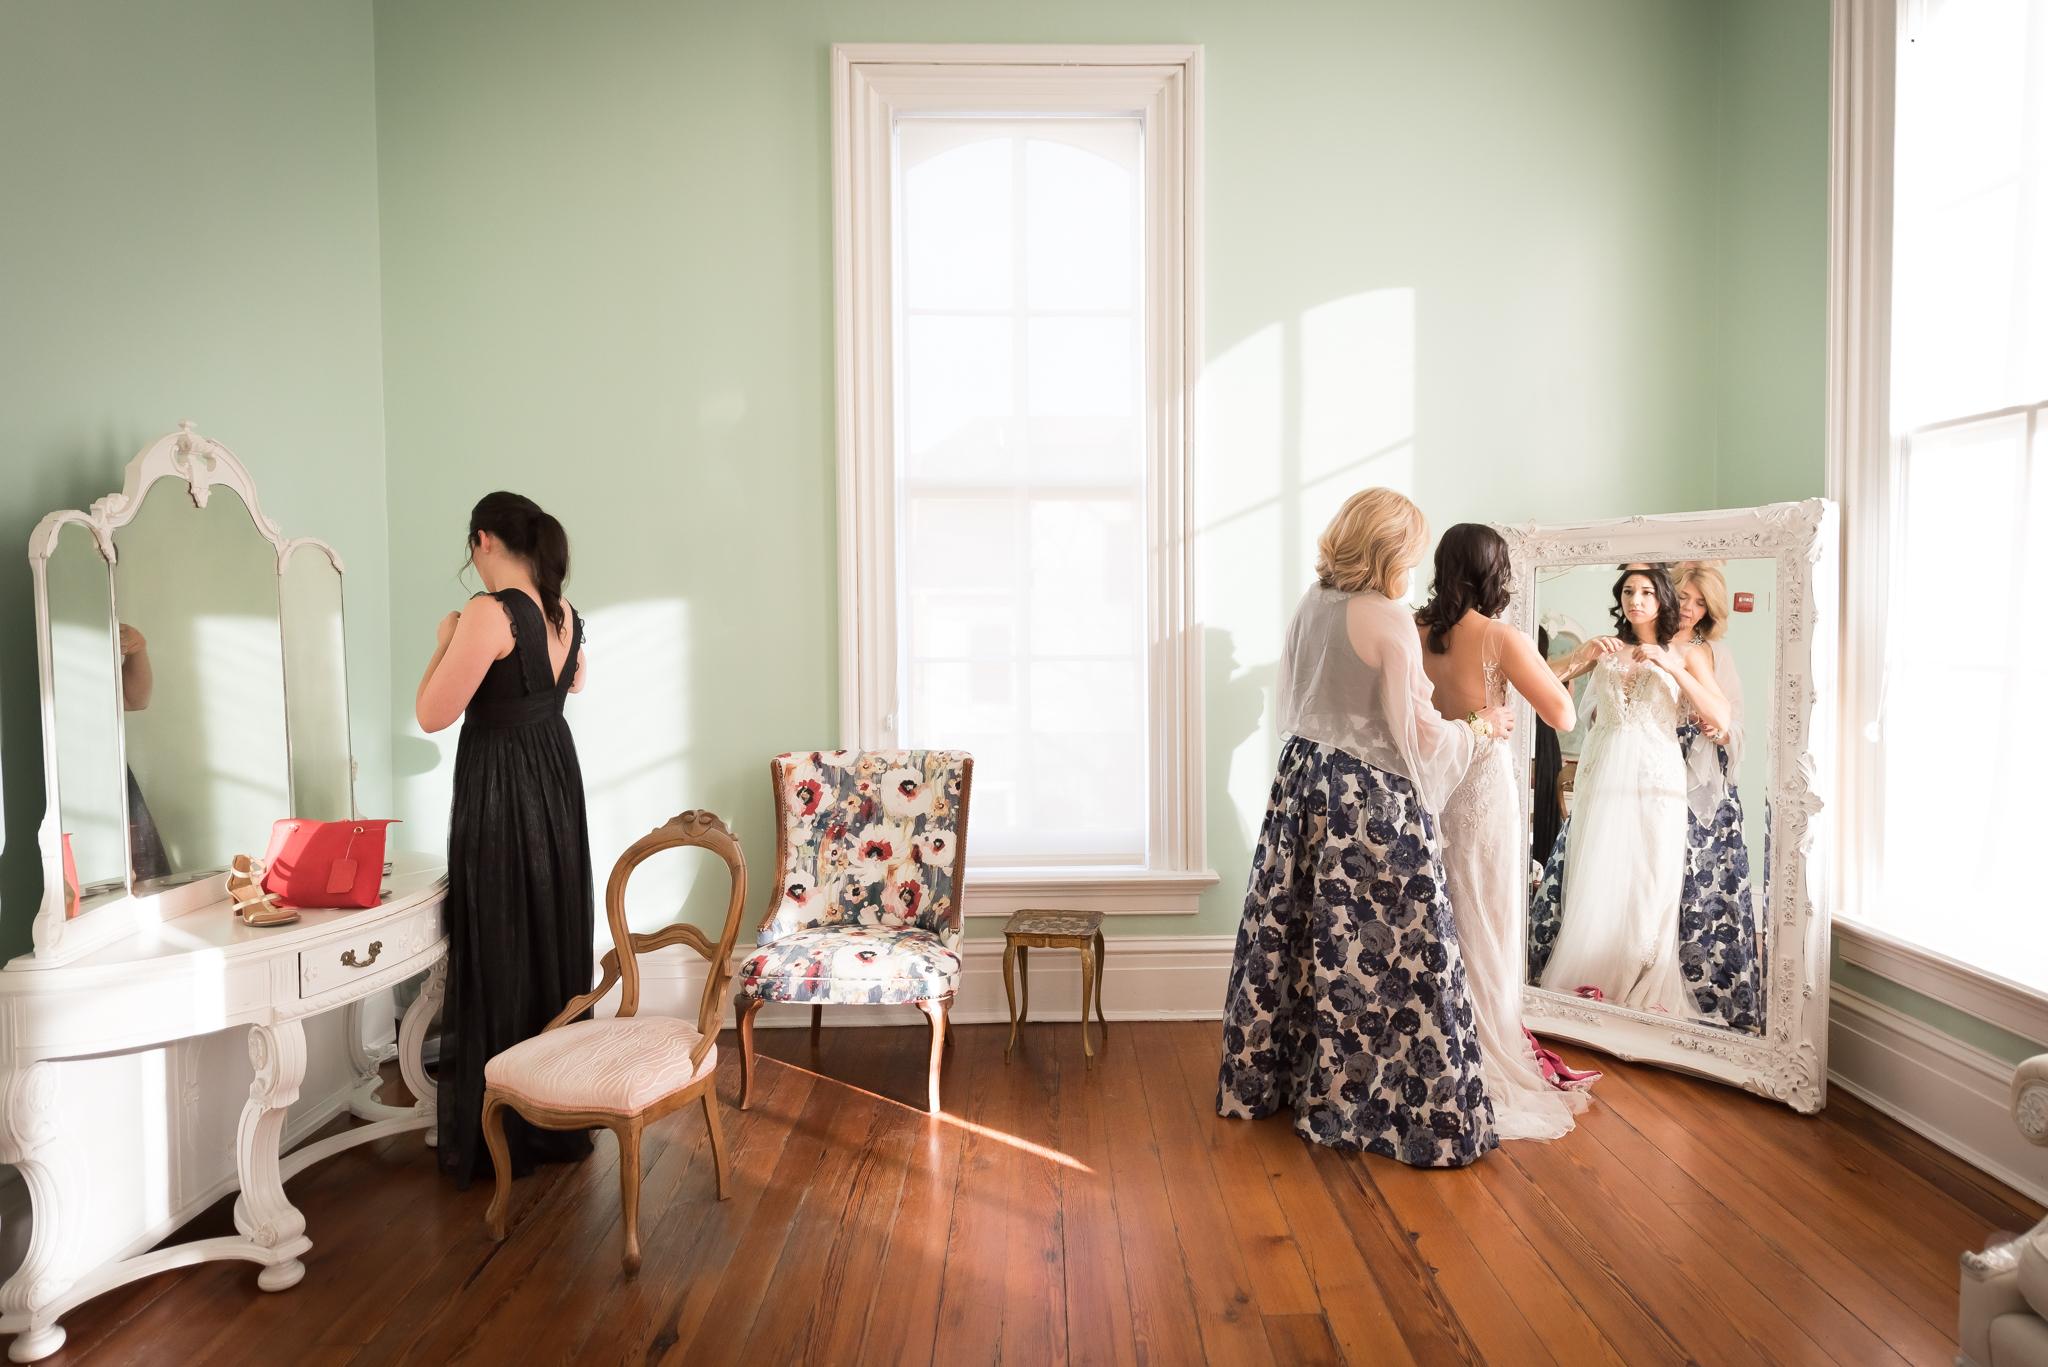 merrimon-wynne-wedding-photography-006.jpg